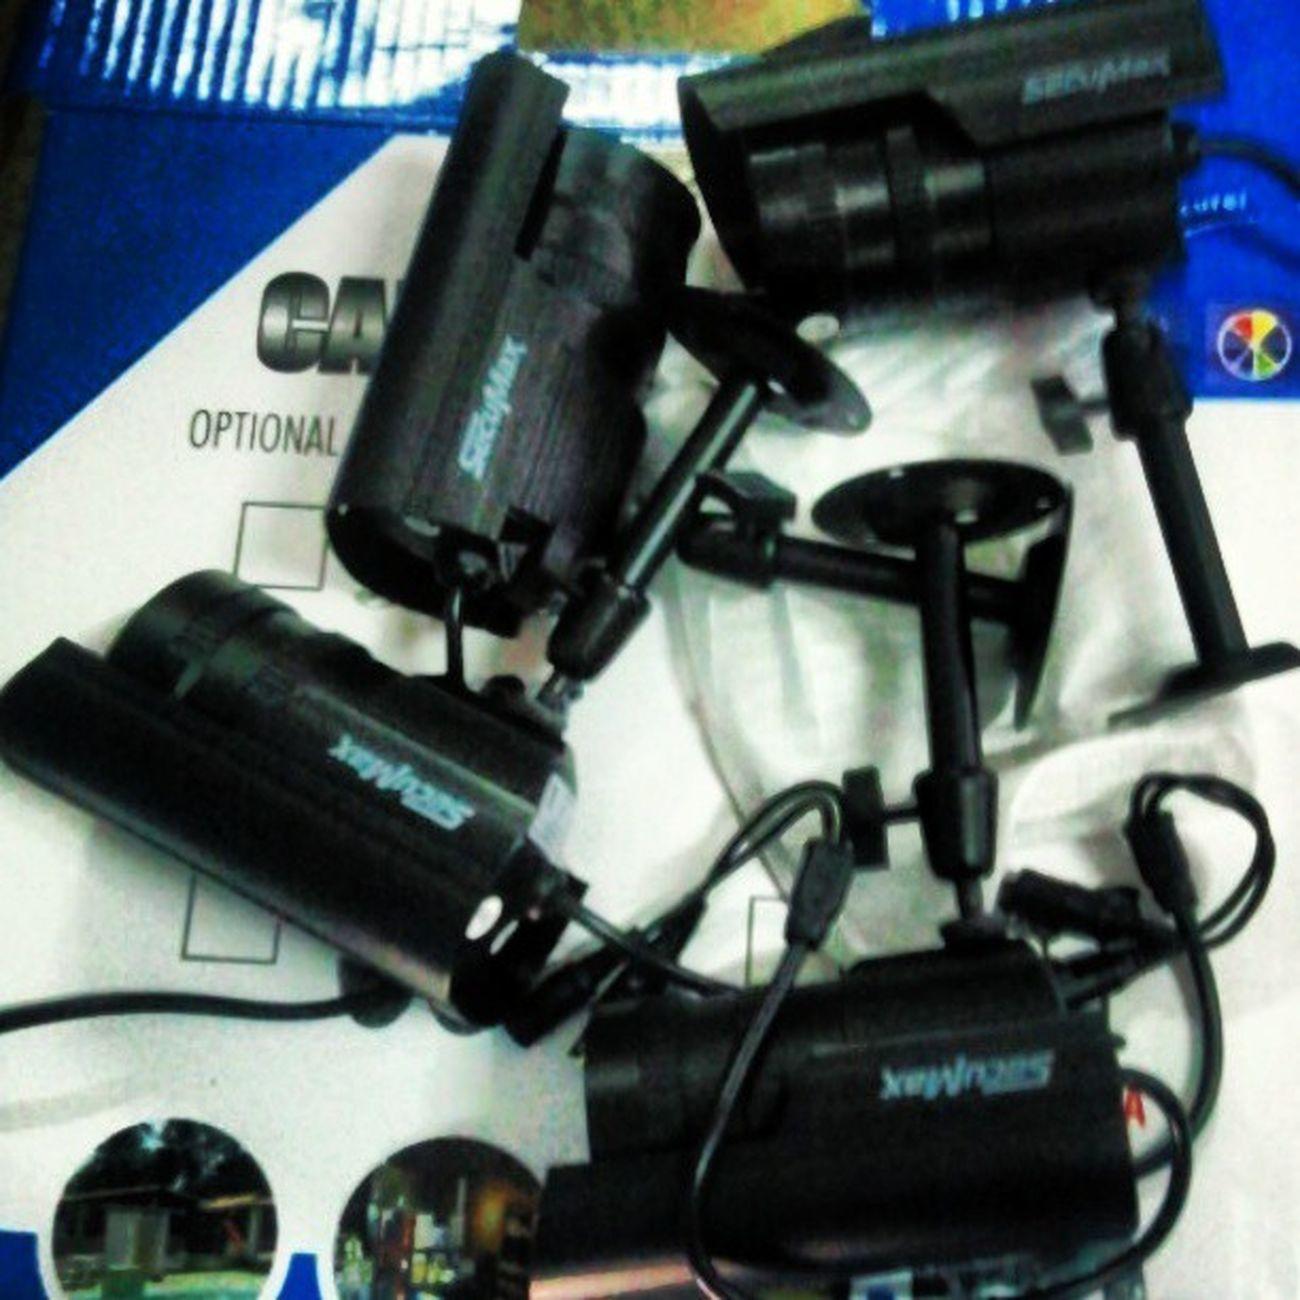 Cameras Contrl Securety